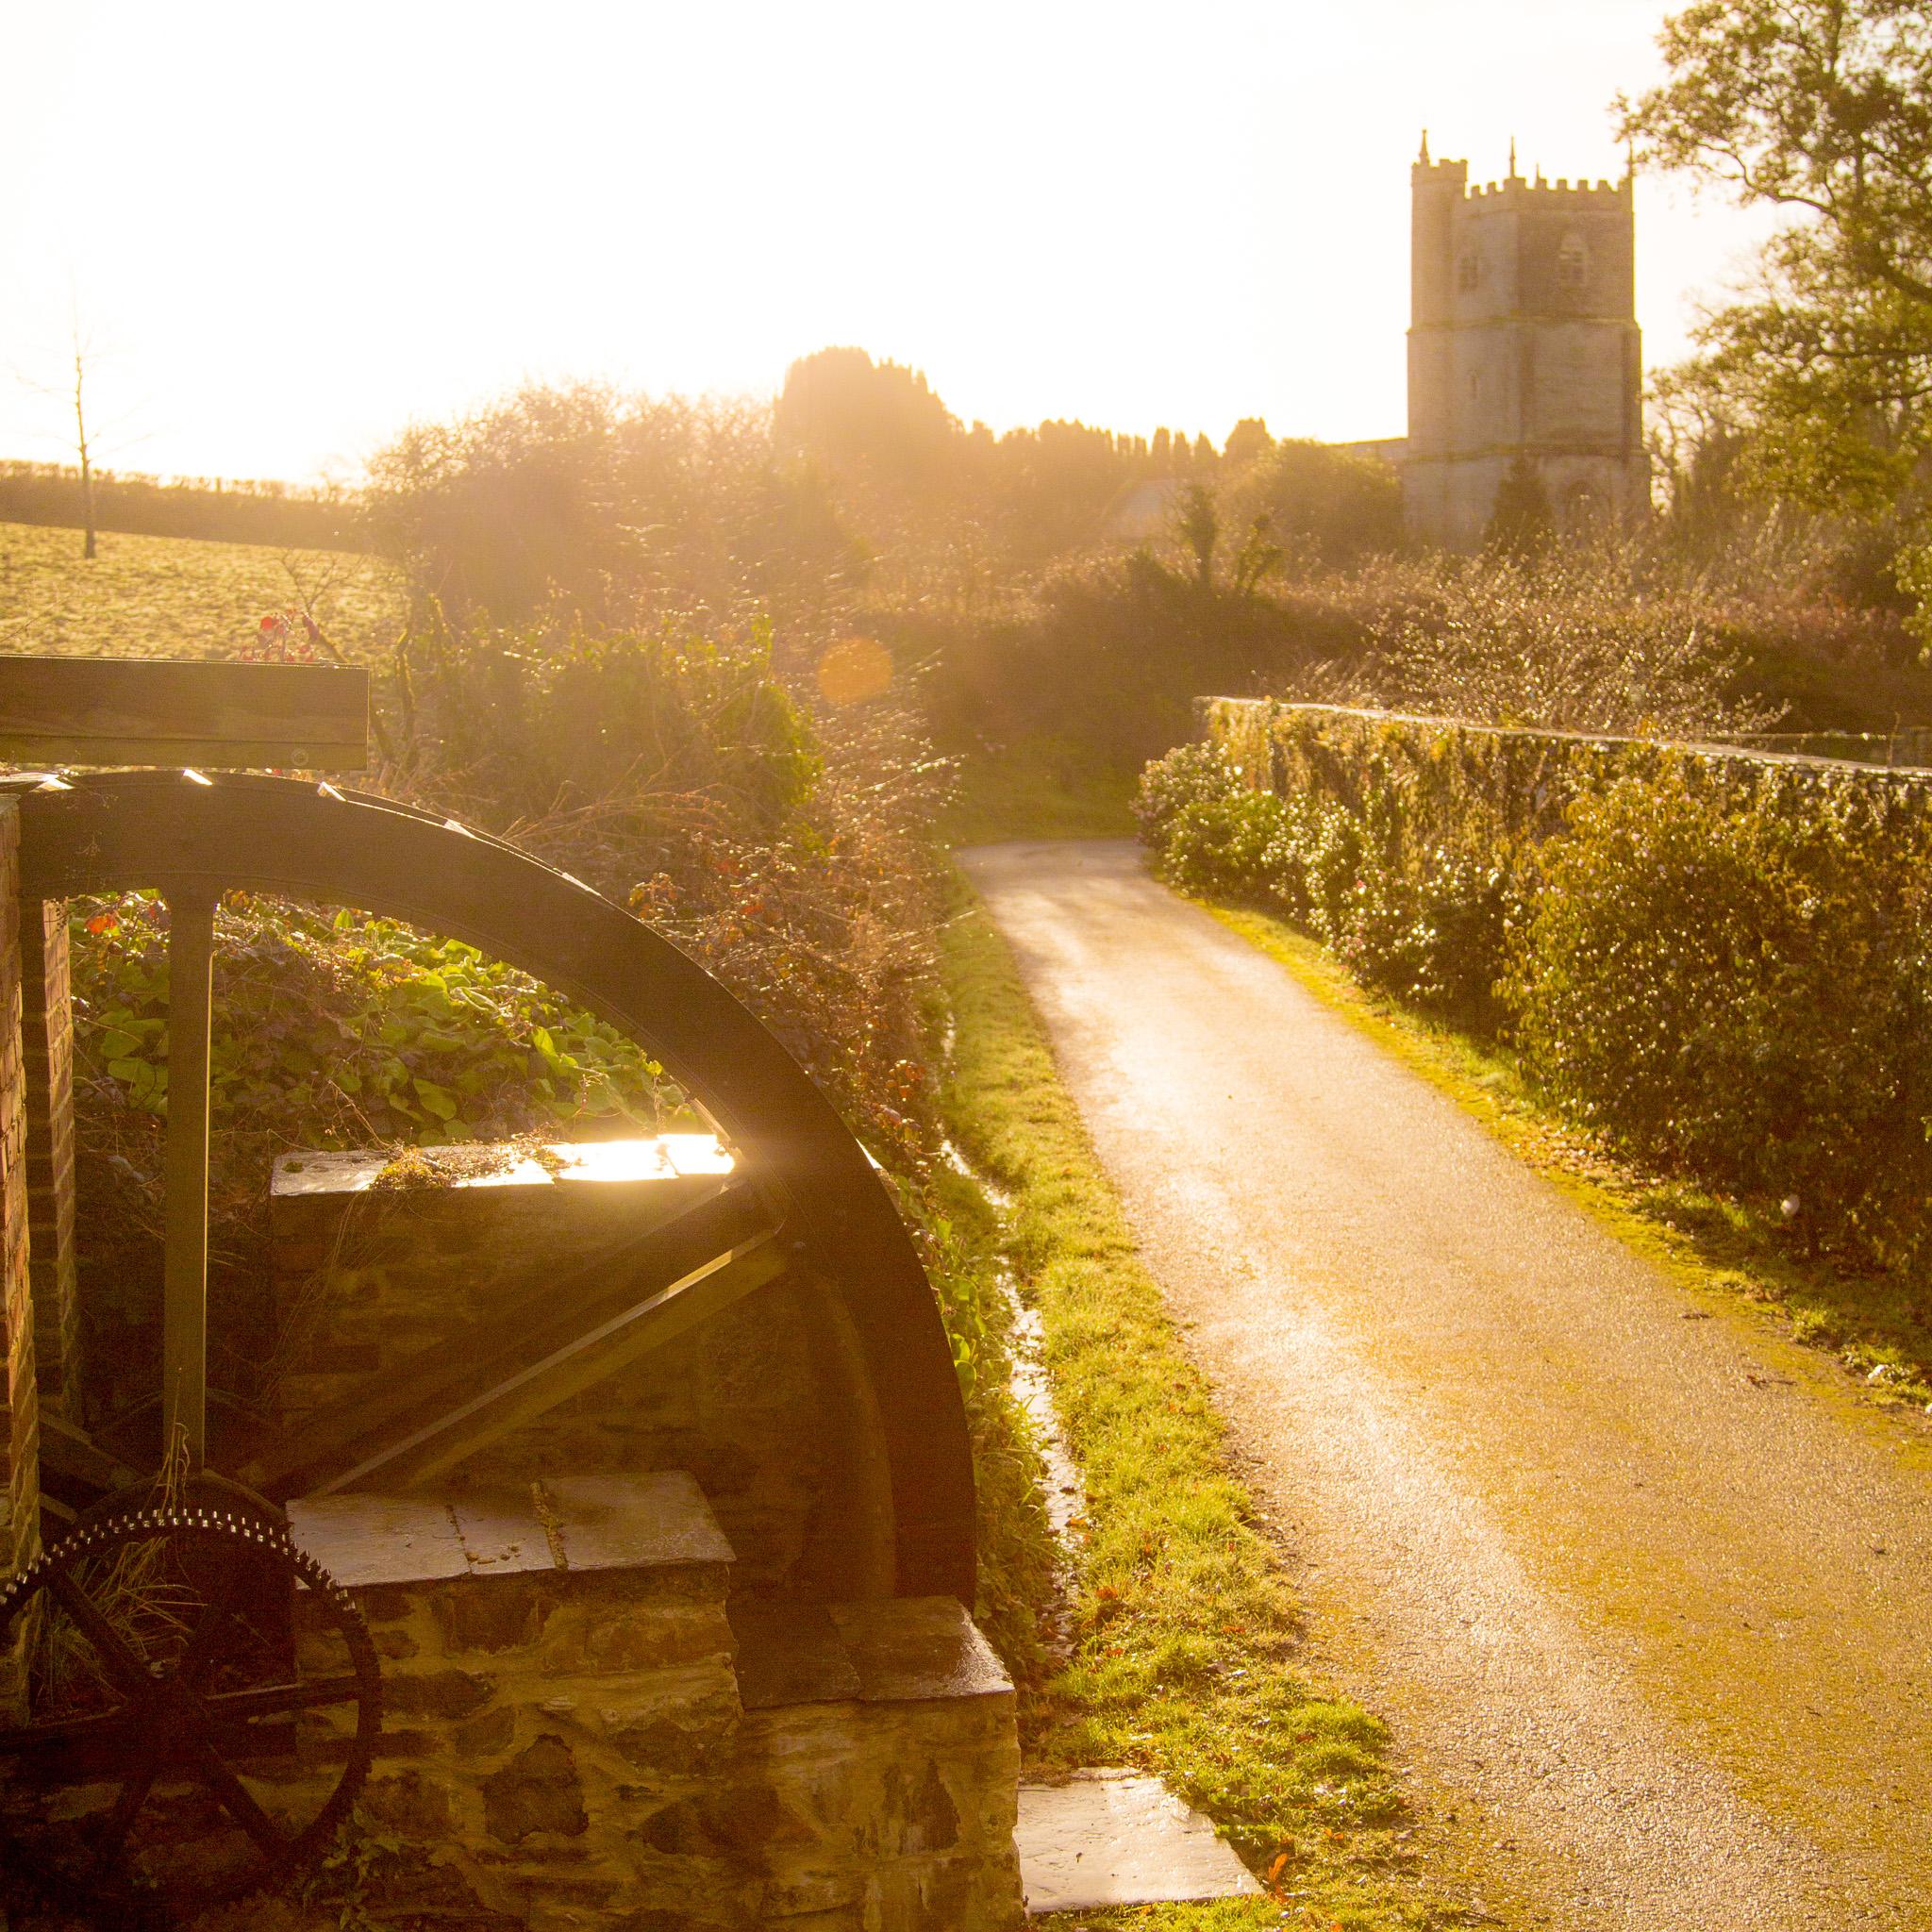 View along drive towards church